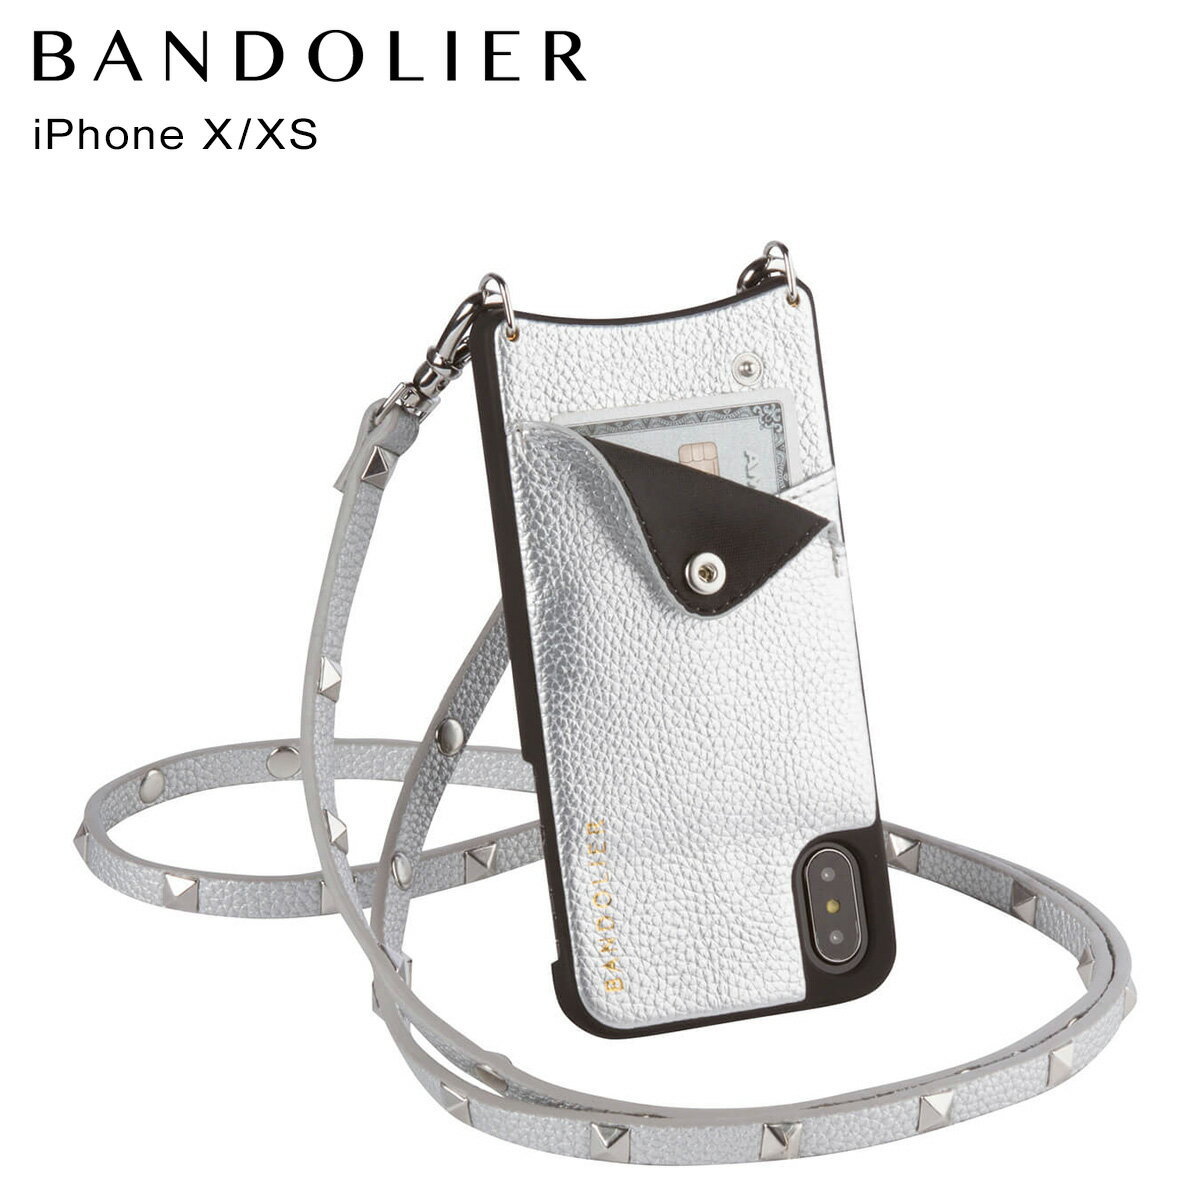 BANDOLIER SARAH RICH SILVER バンドリヤー iPhoneXS X ケース スマホ アイフォン メンズ レディース